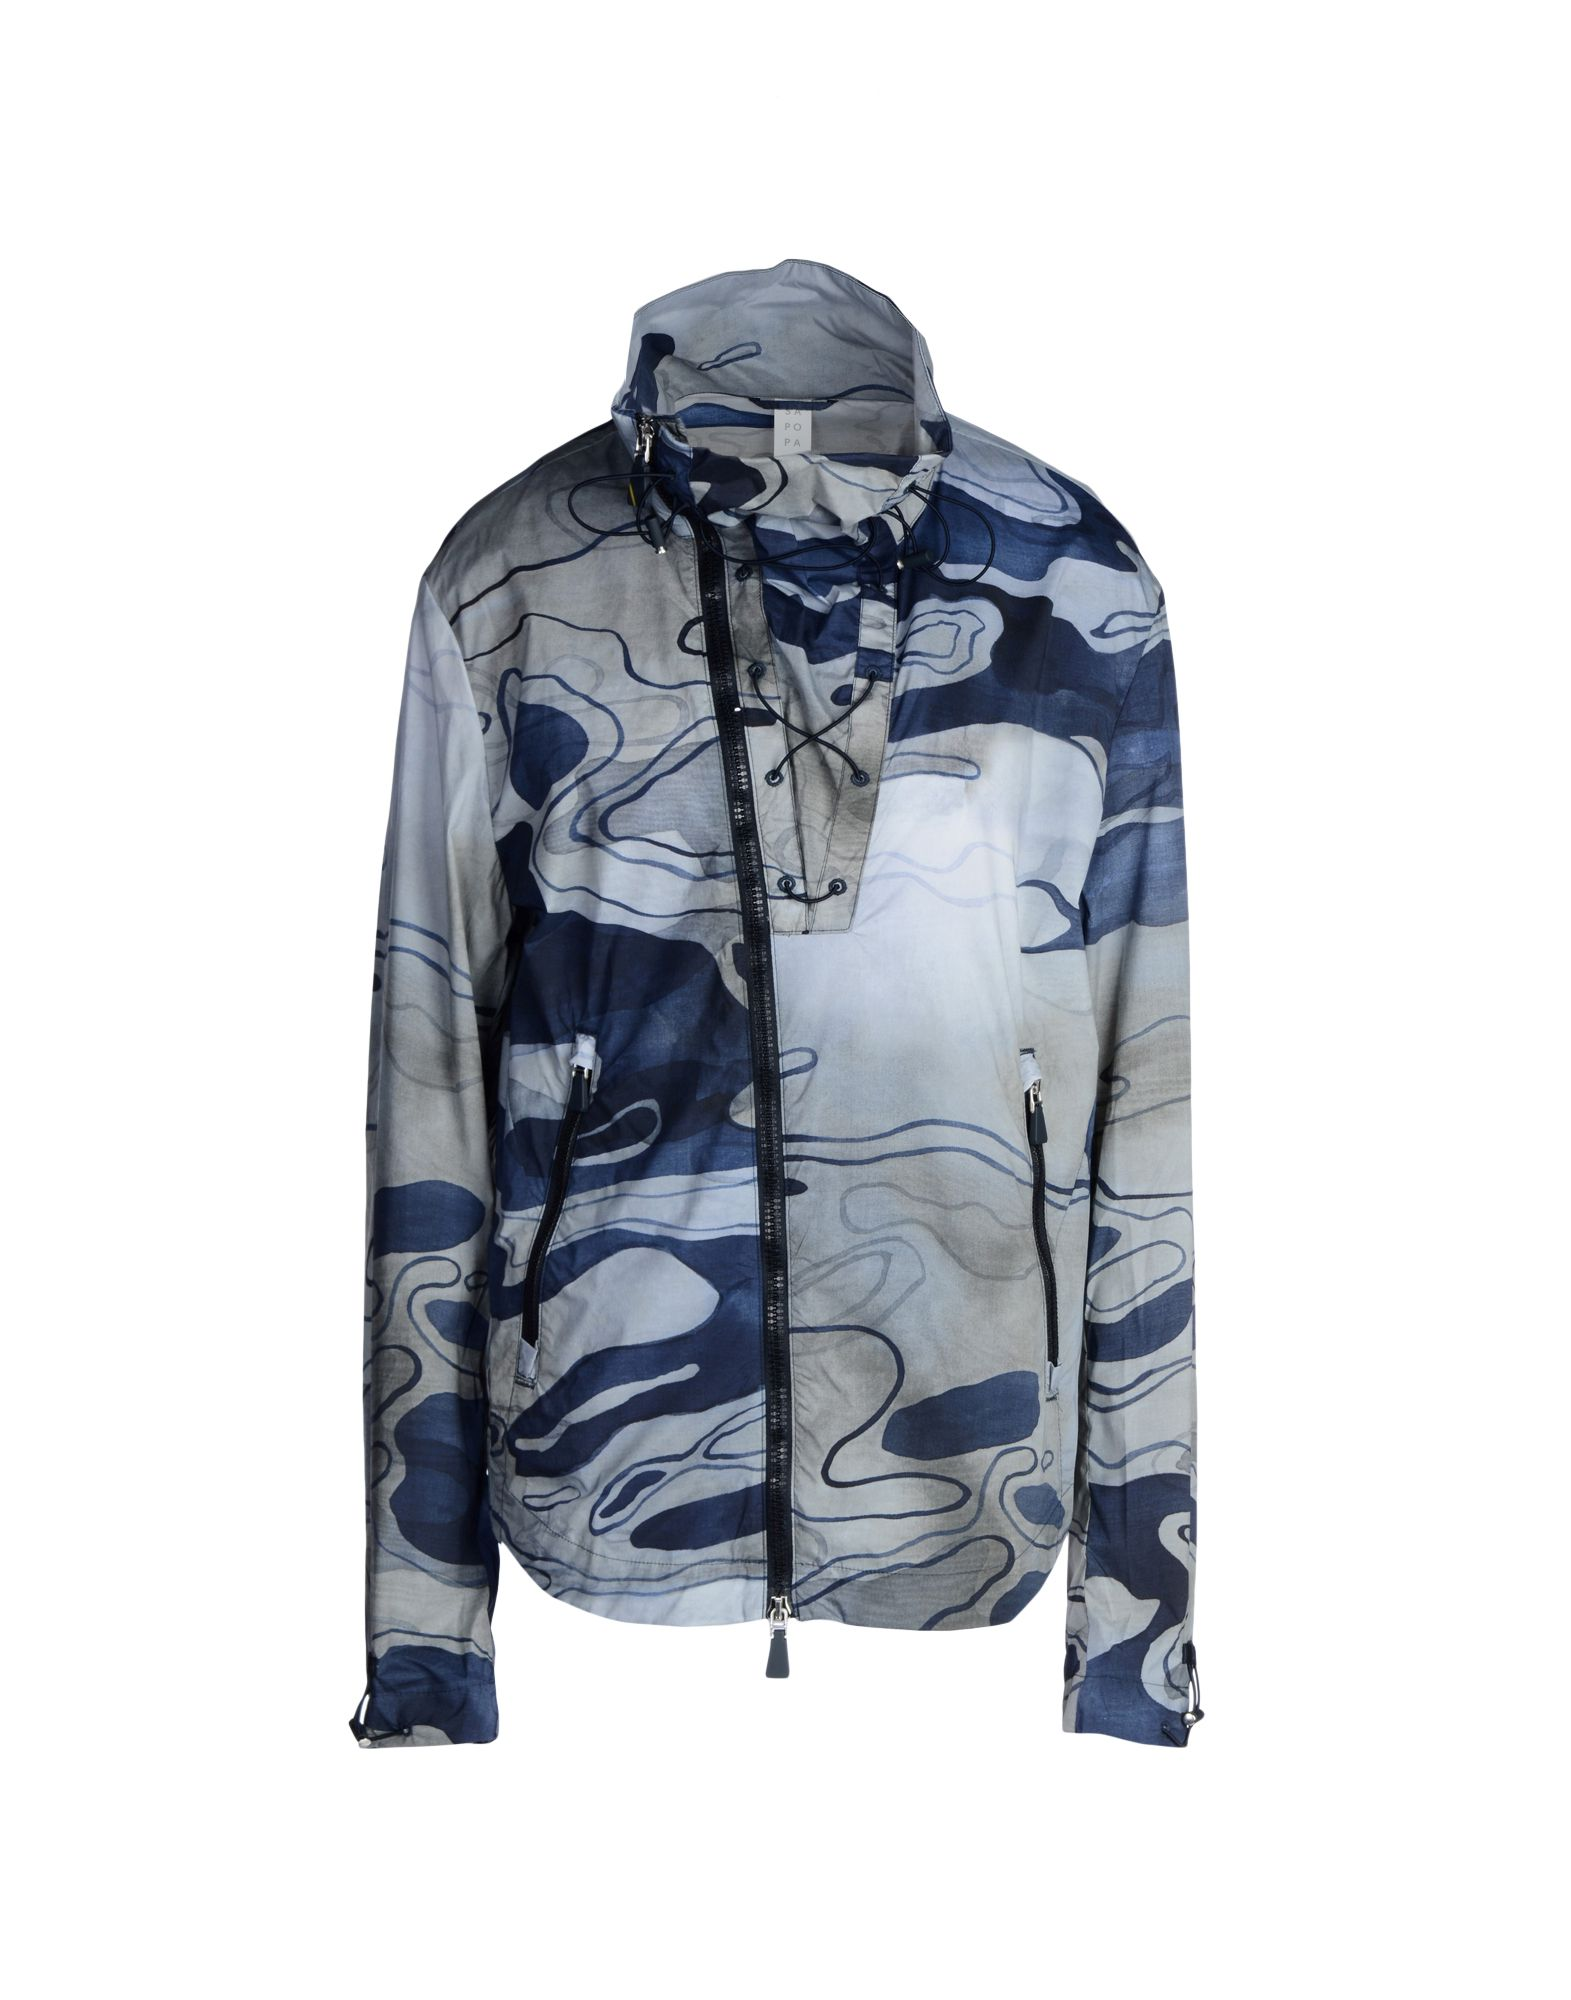 Giubbotto Sàpopa Pullover Jacket Tramontana - Uomo - Acquista online su